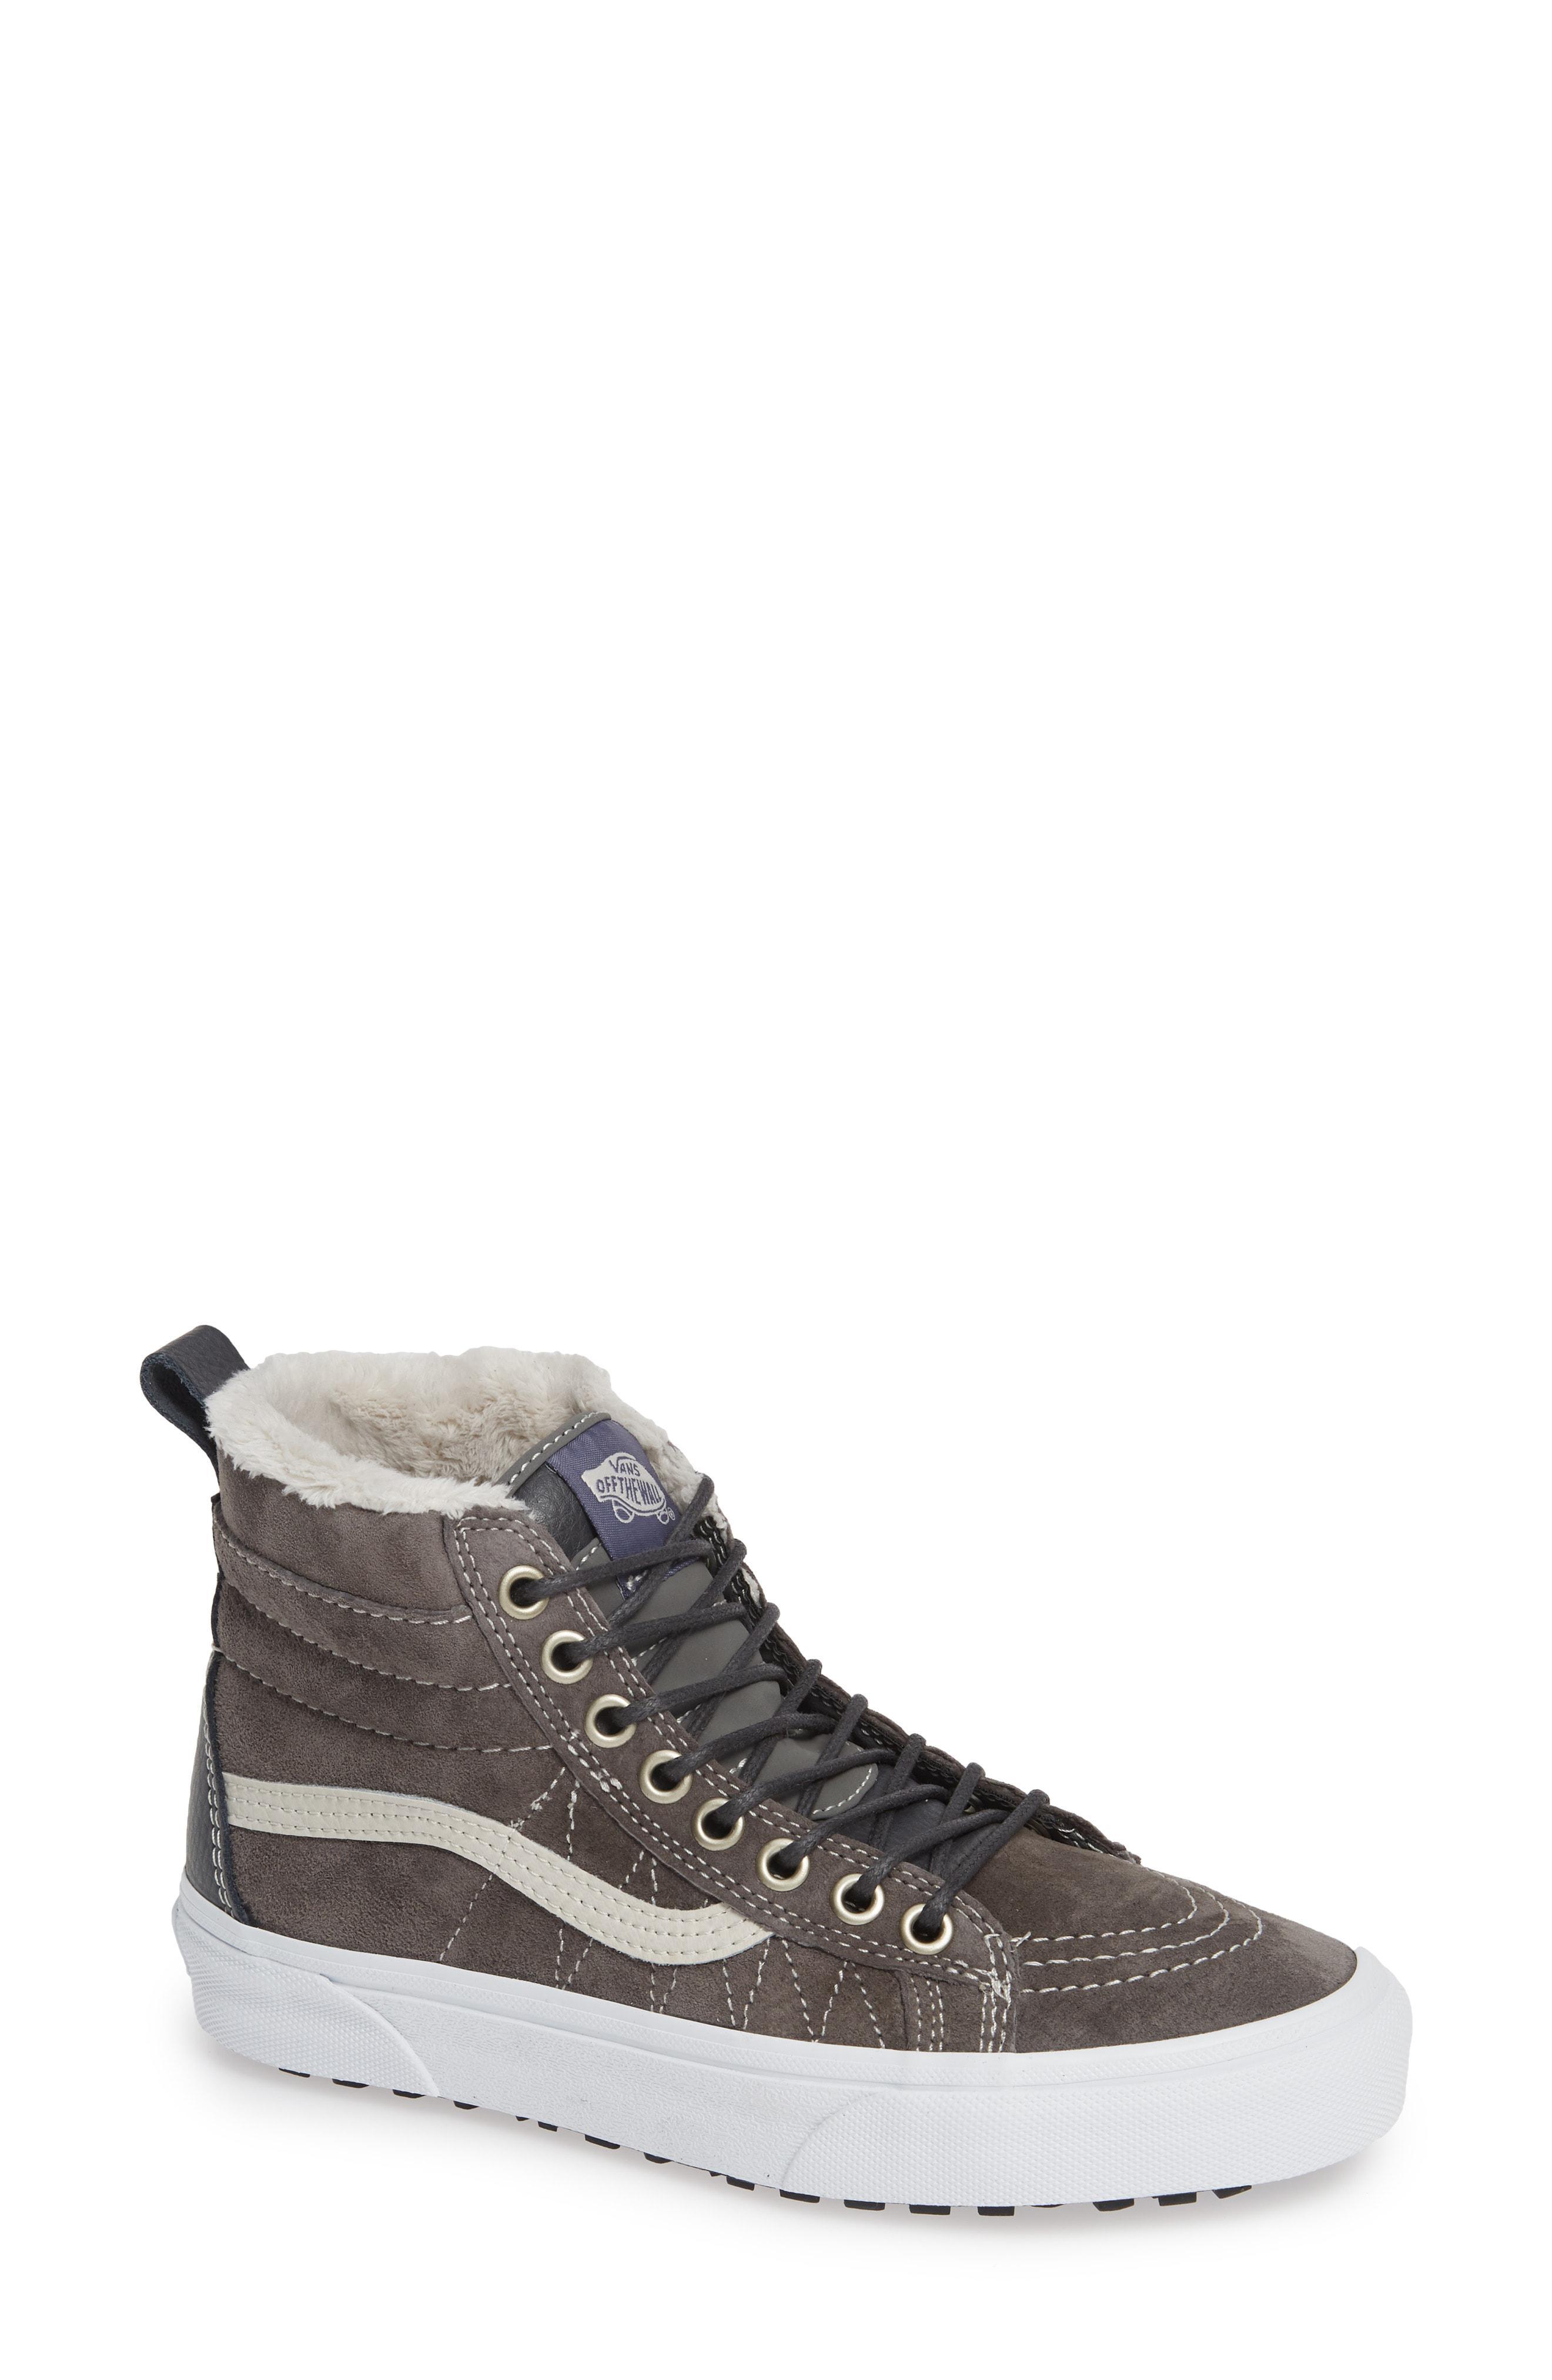 4fa06b9b041 Lyst - Vans Sk-8 Hi Mte Sneaker in Black